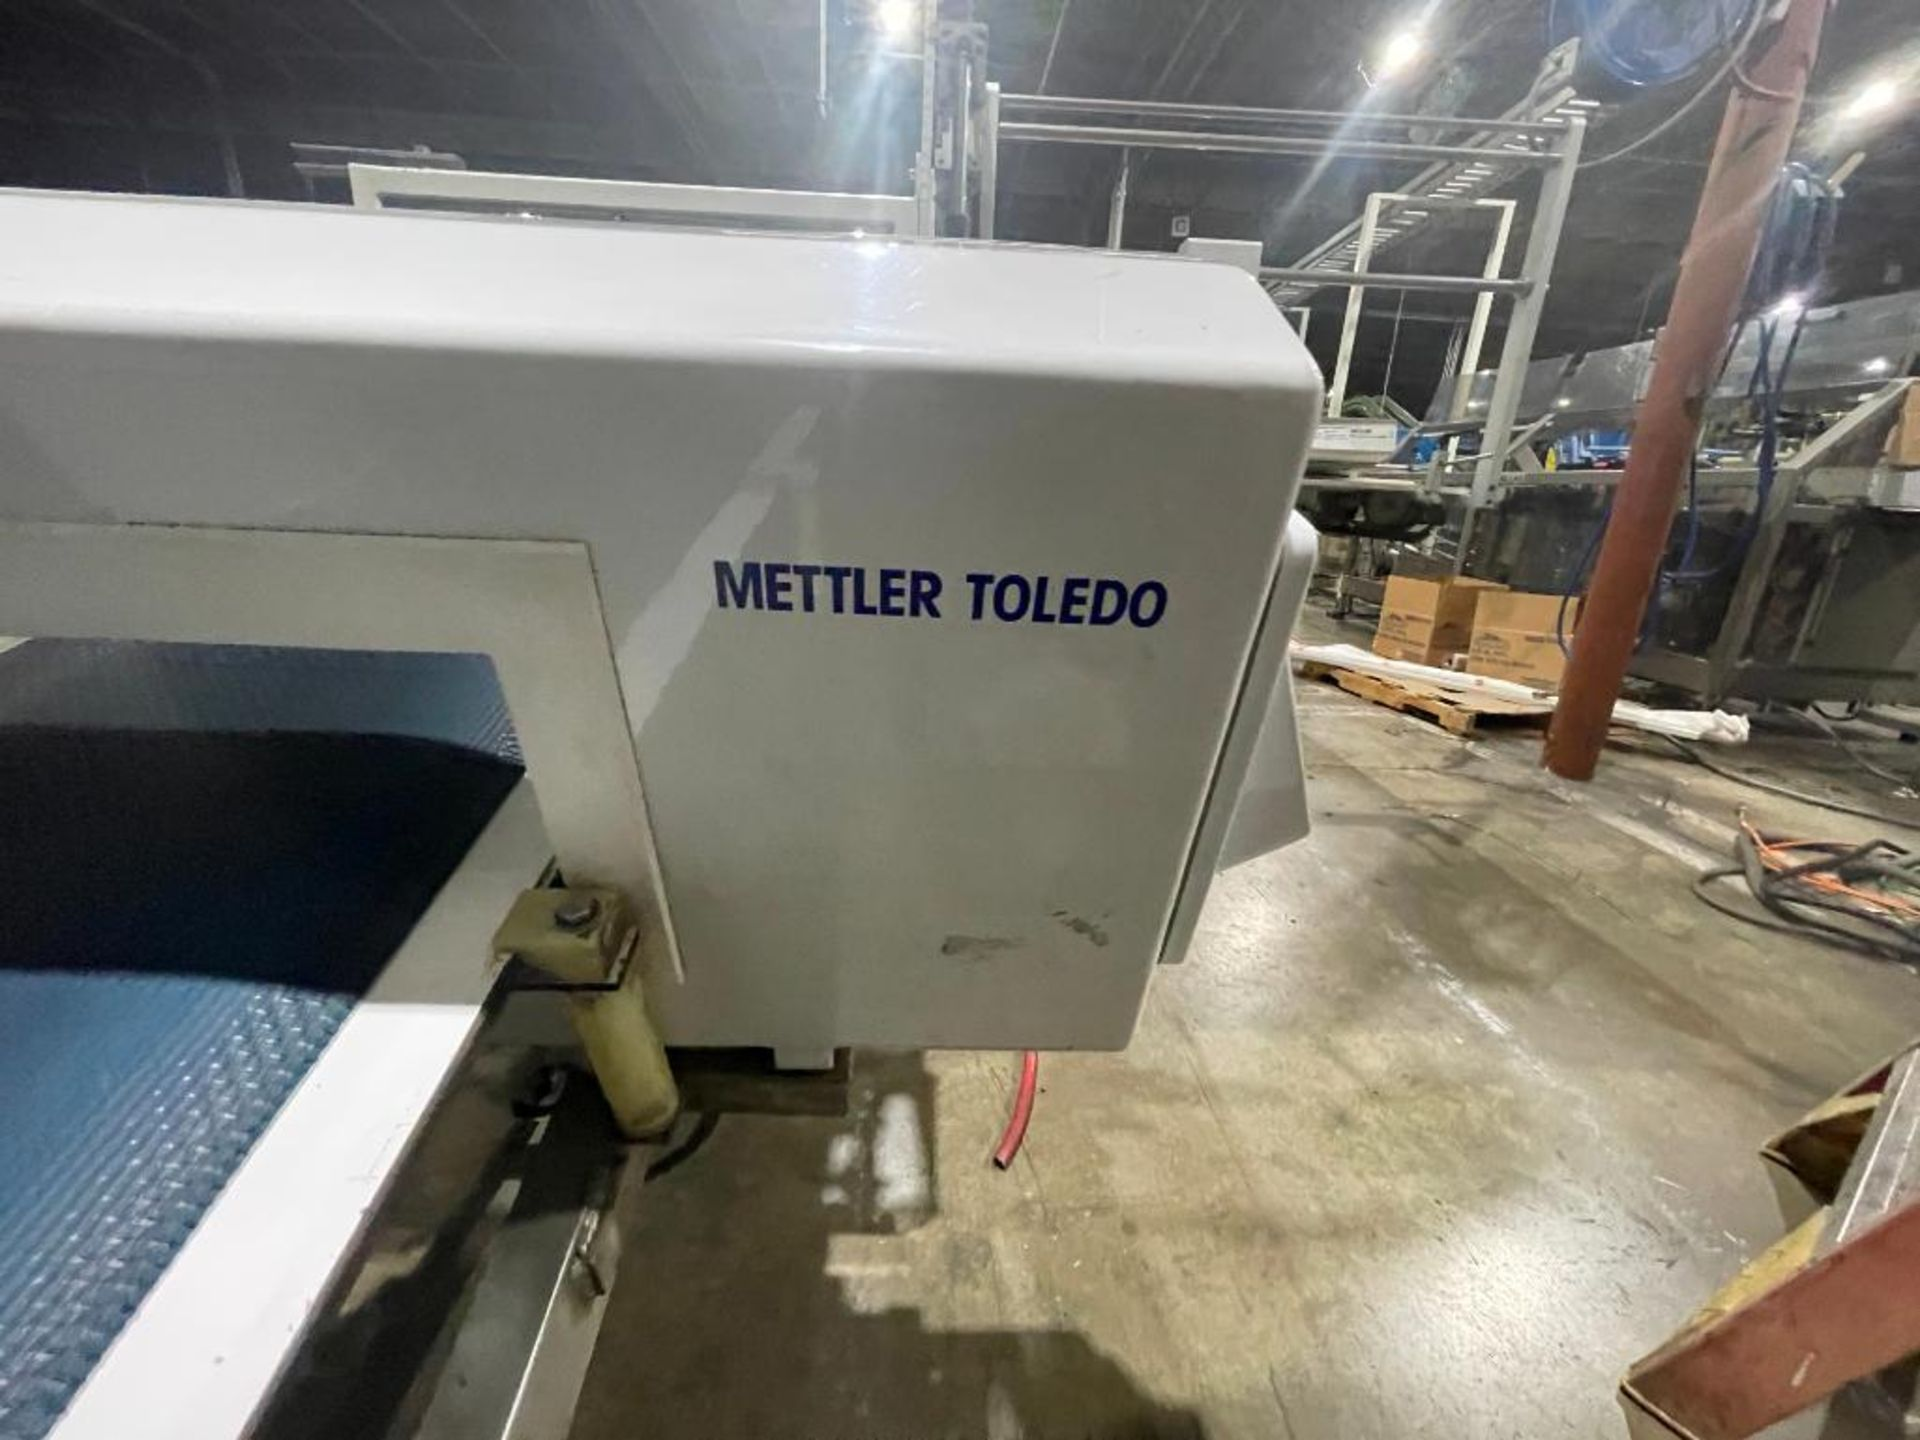 Mettler Toledo metal detector, model V4-1 - Image 5 of 14